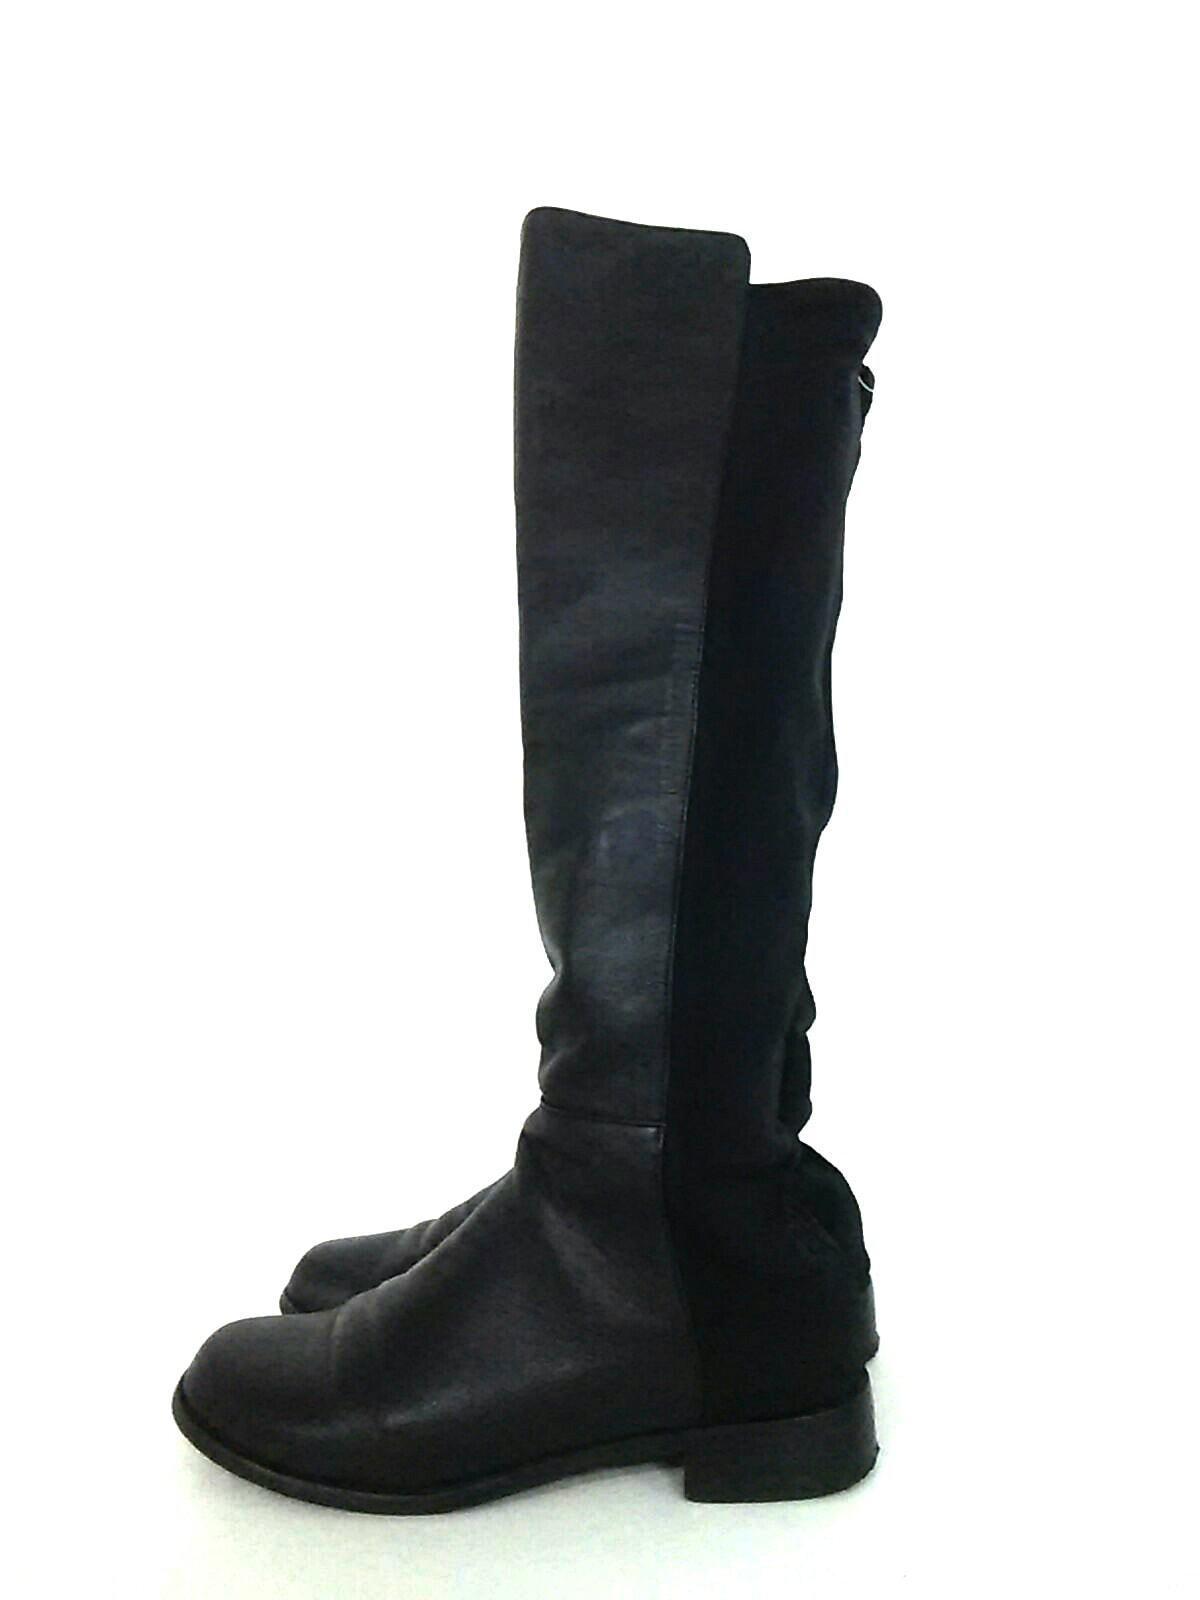 ENCHANTEMENT...?(アンシャントマン)のブーツ